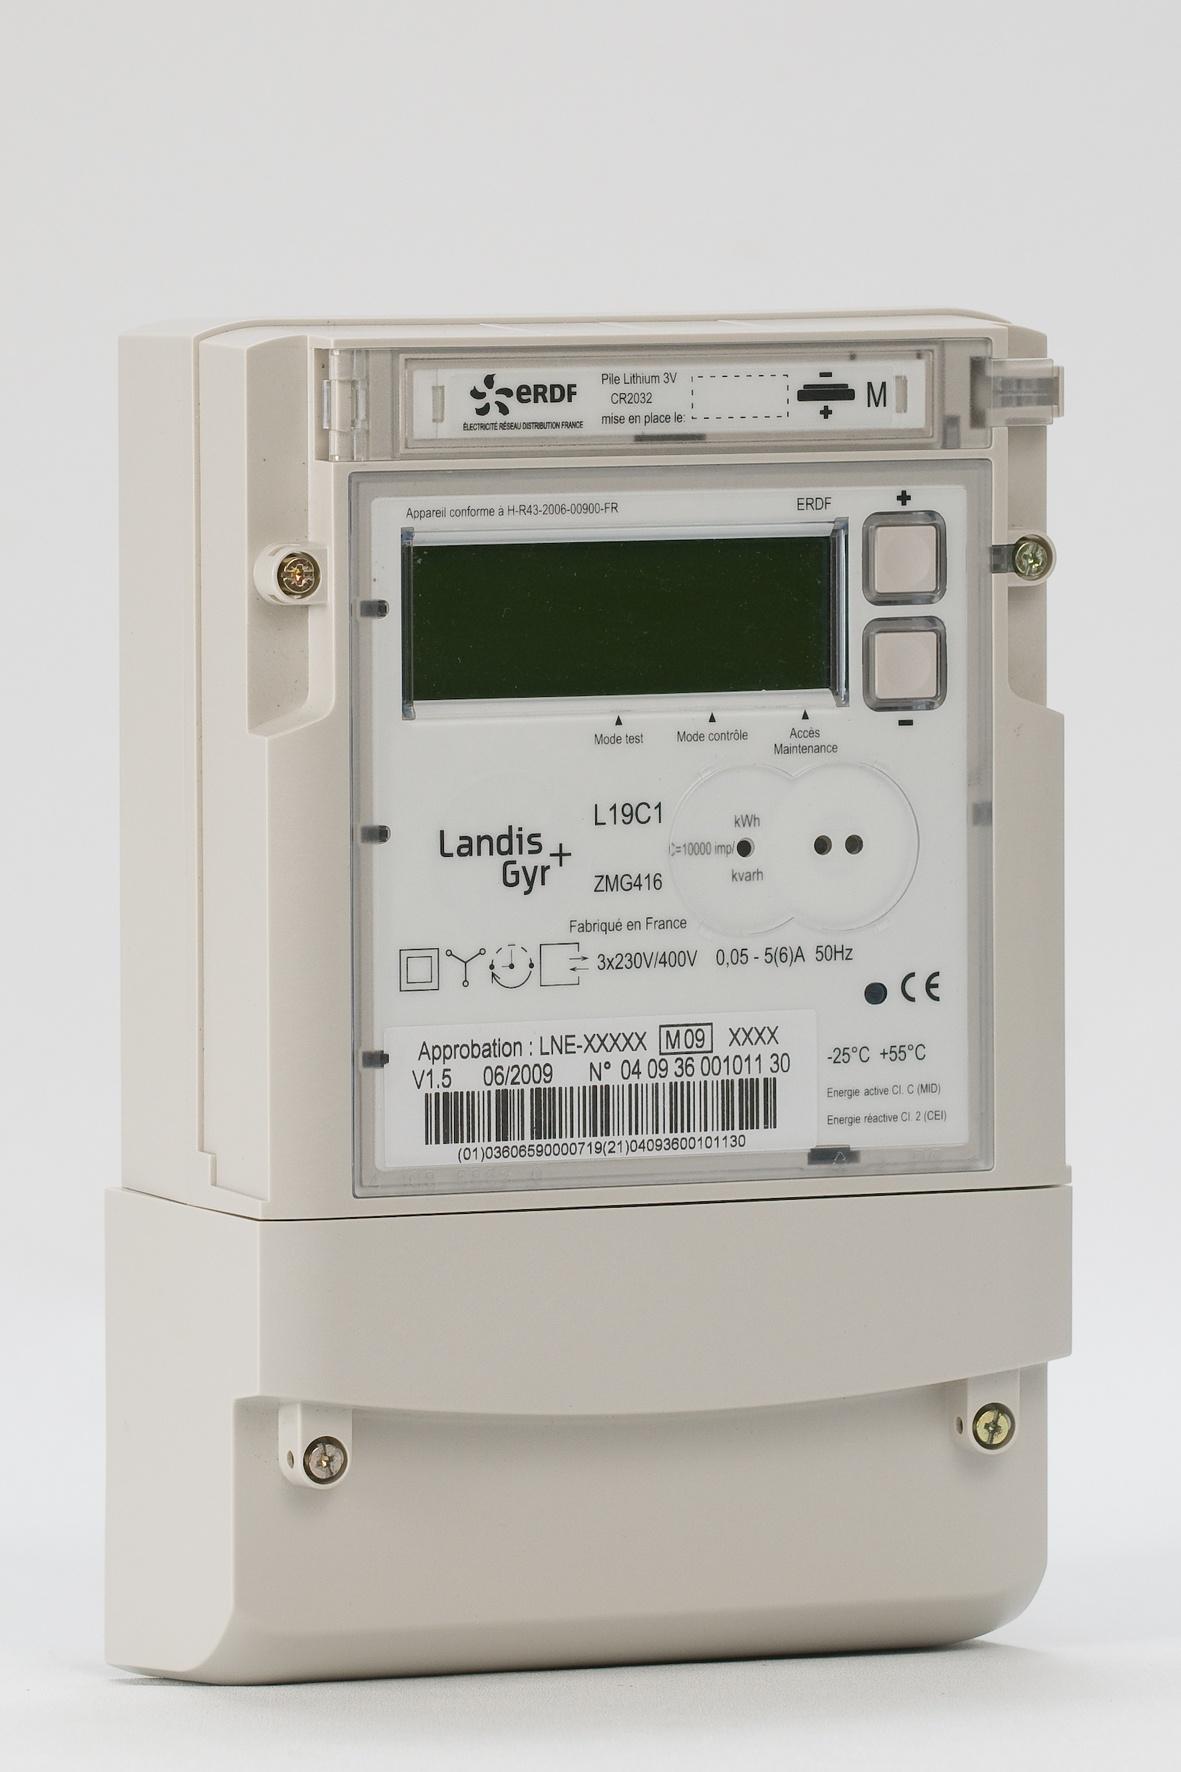 ERDF chooses Landis+Gyr technology for the renewal of its meter park